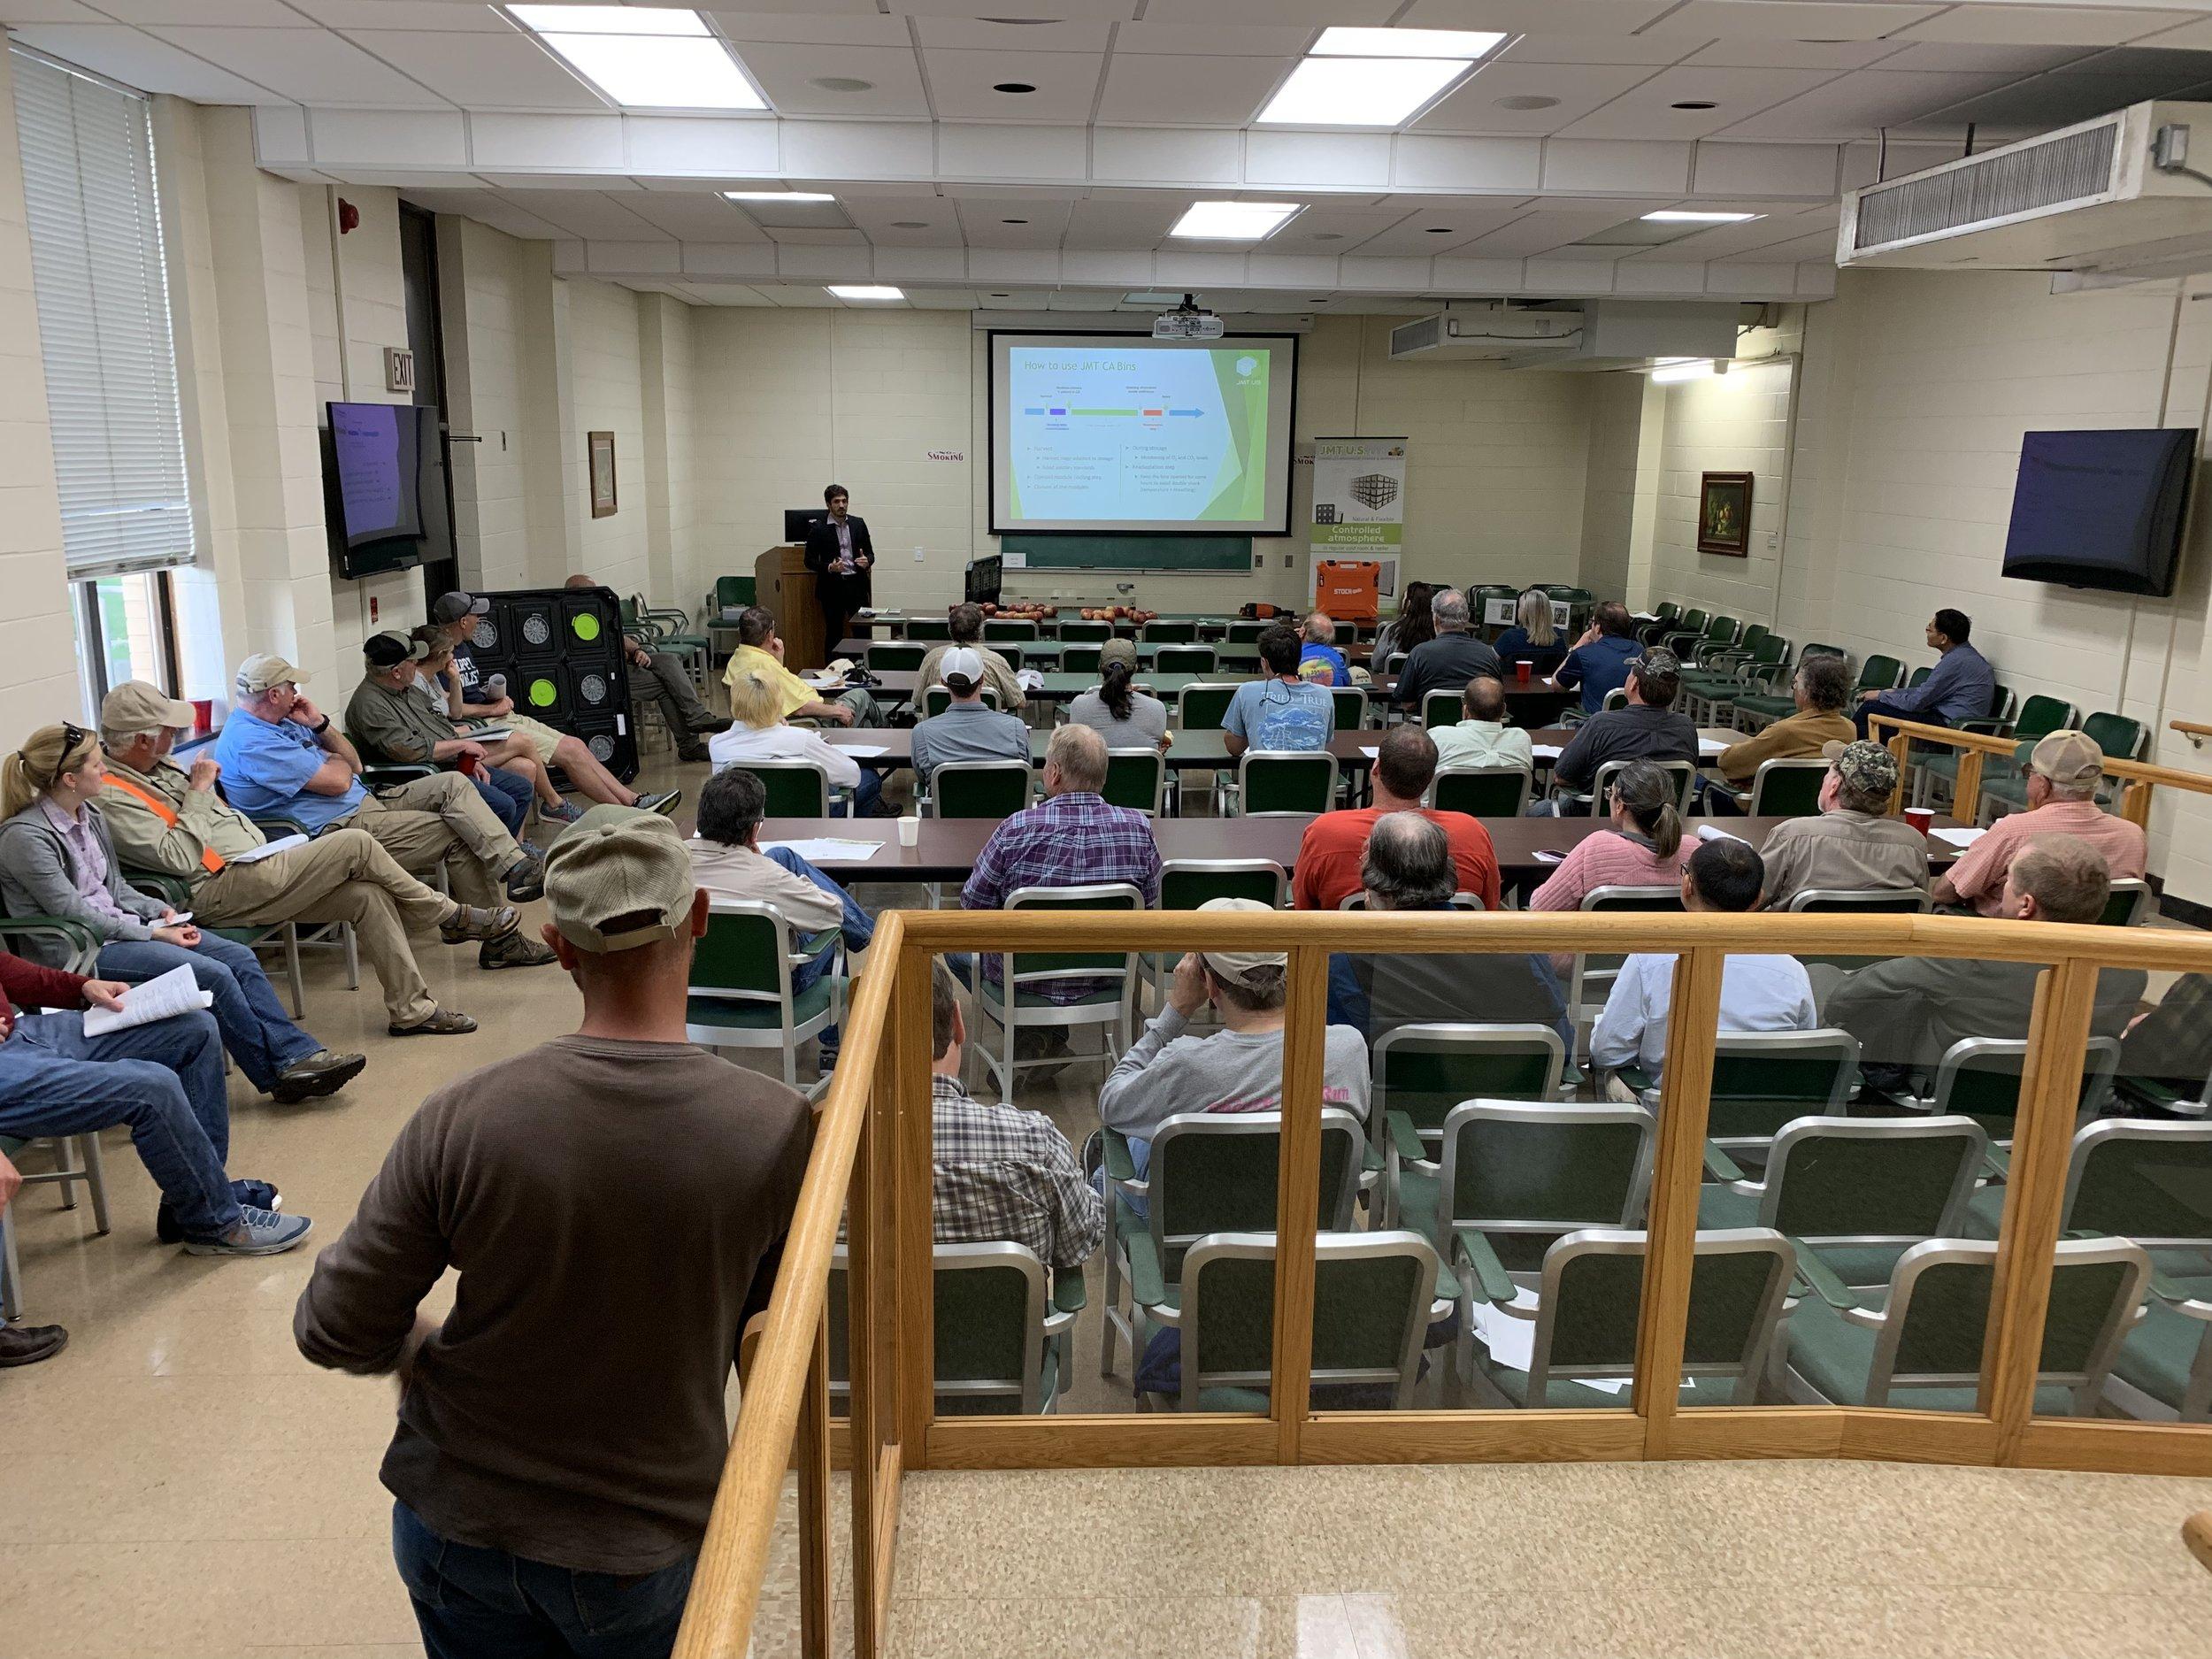 JMT US_7_Penn State presentation.JPG